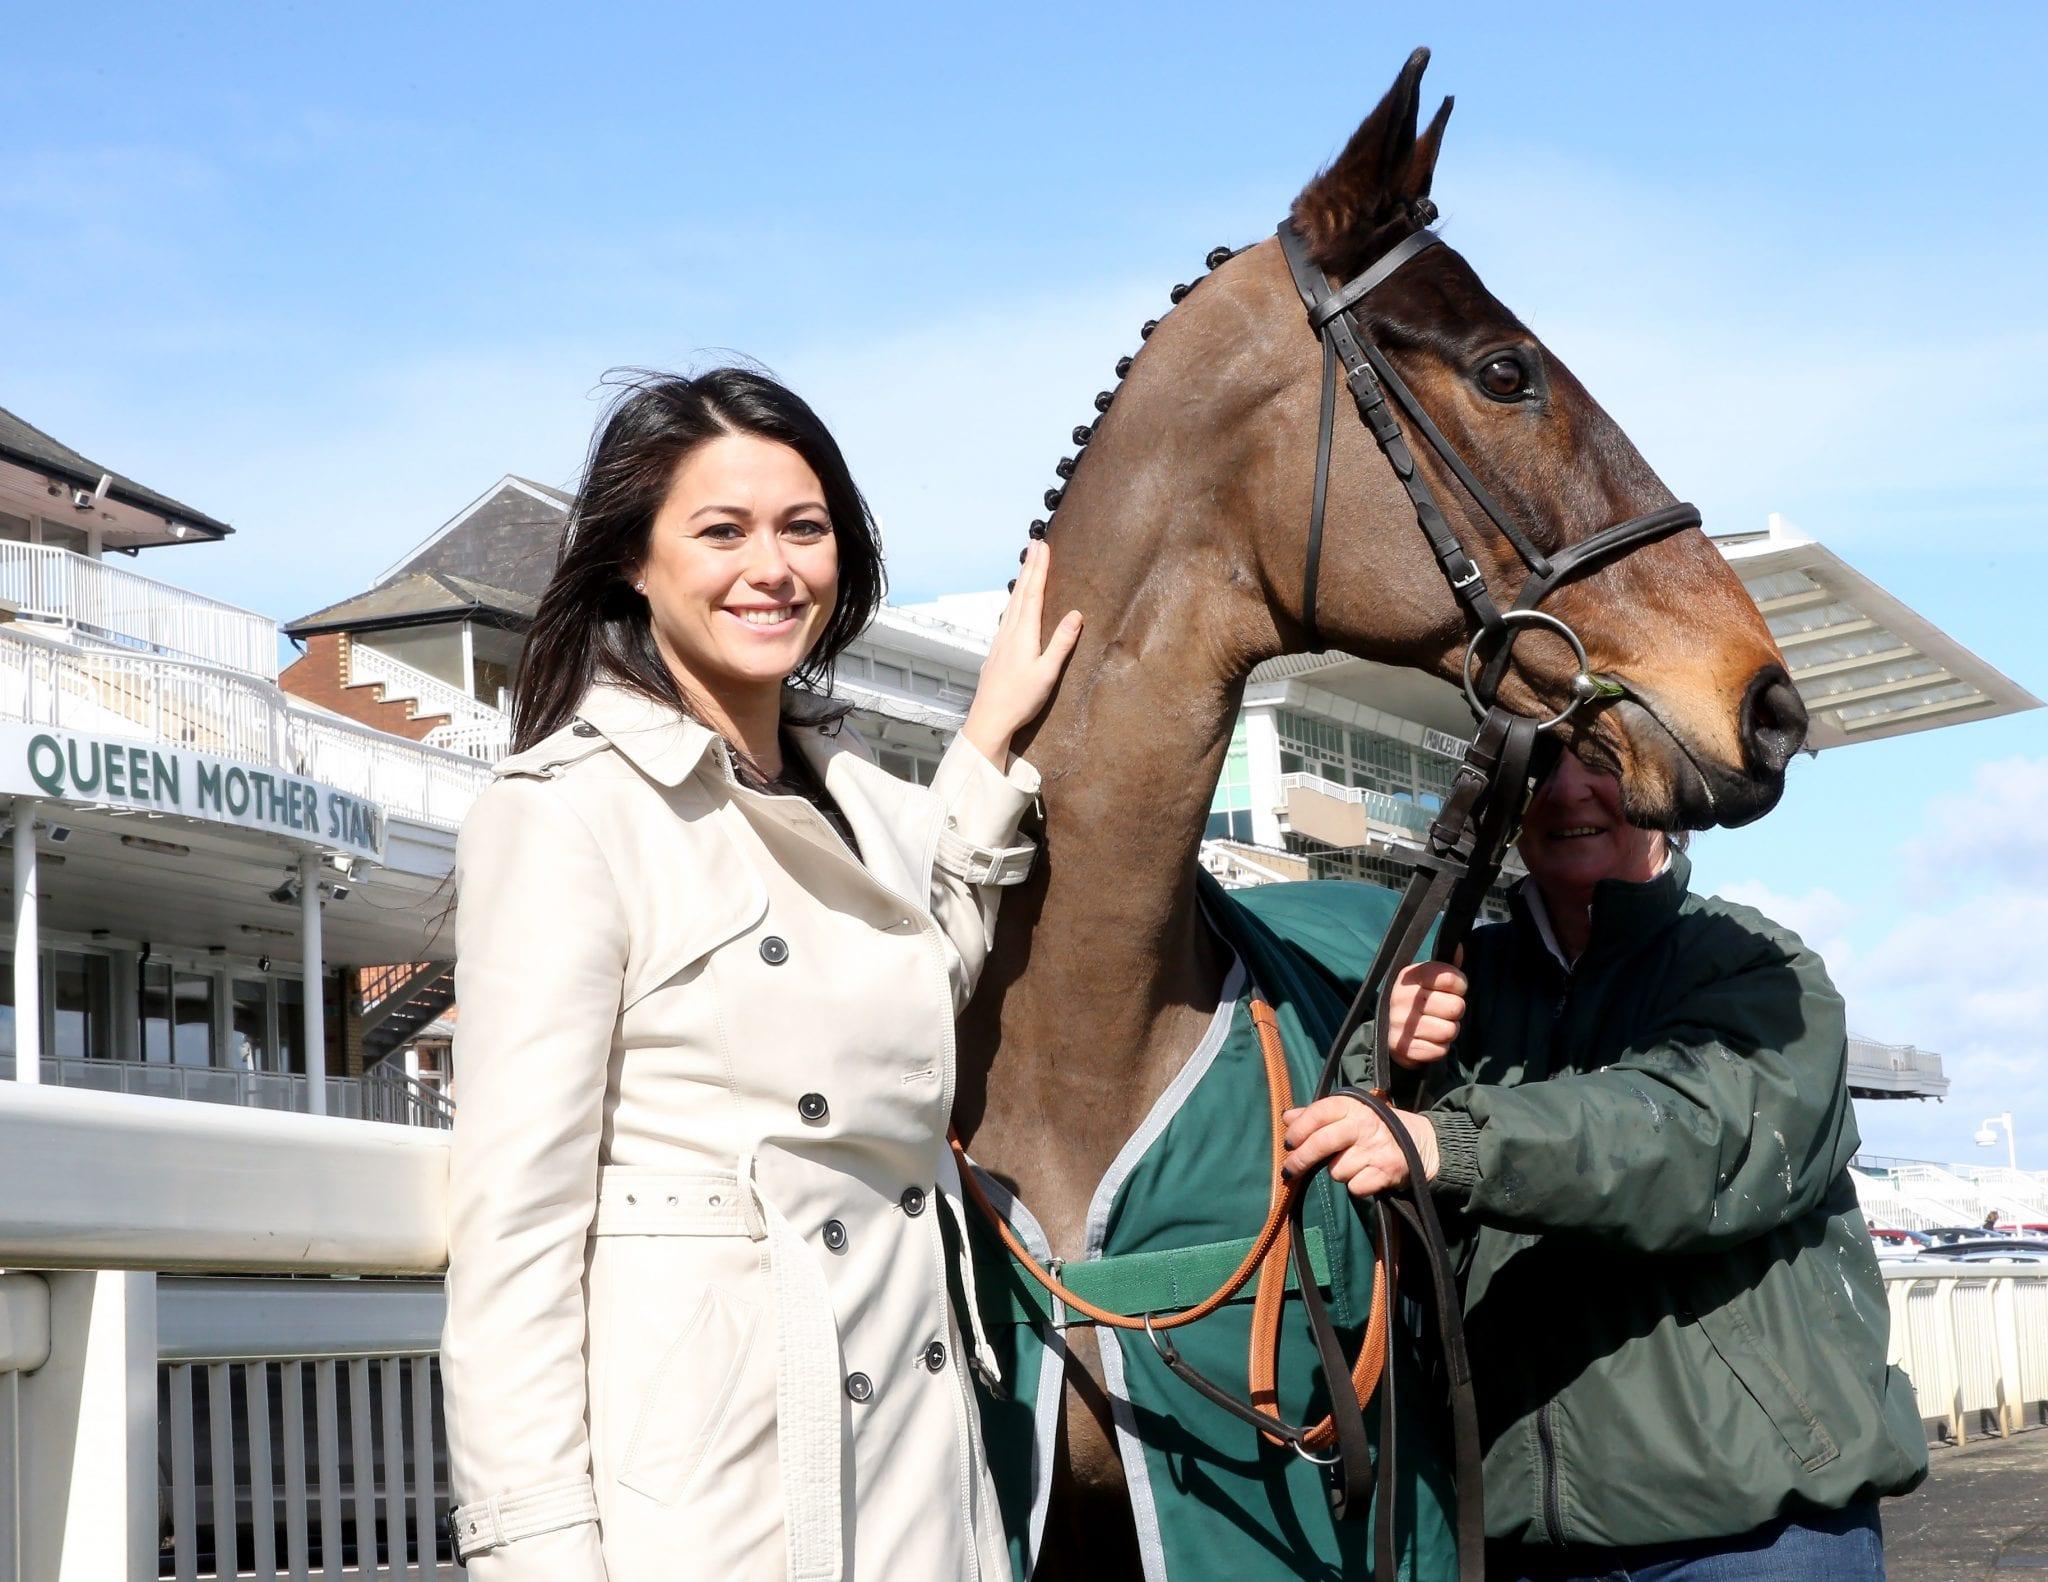 Jockey Club North West Offers £20,000 Development Award for Female Jockeys